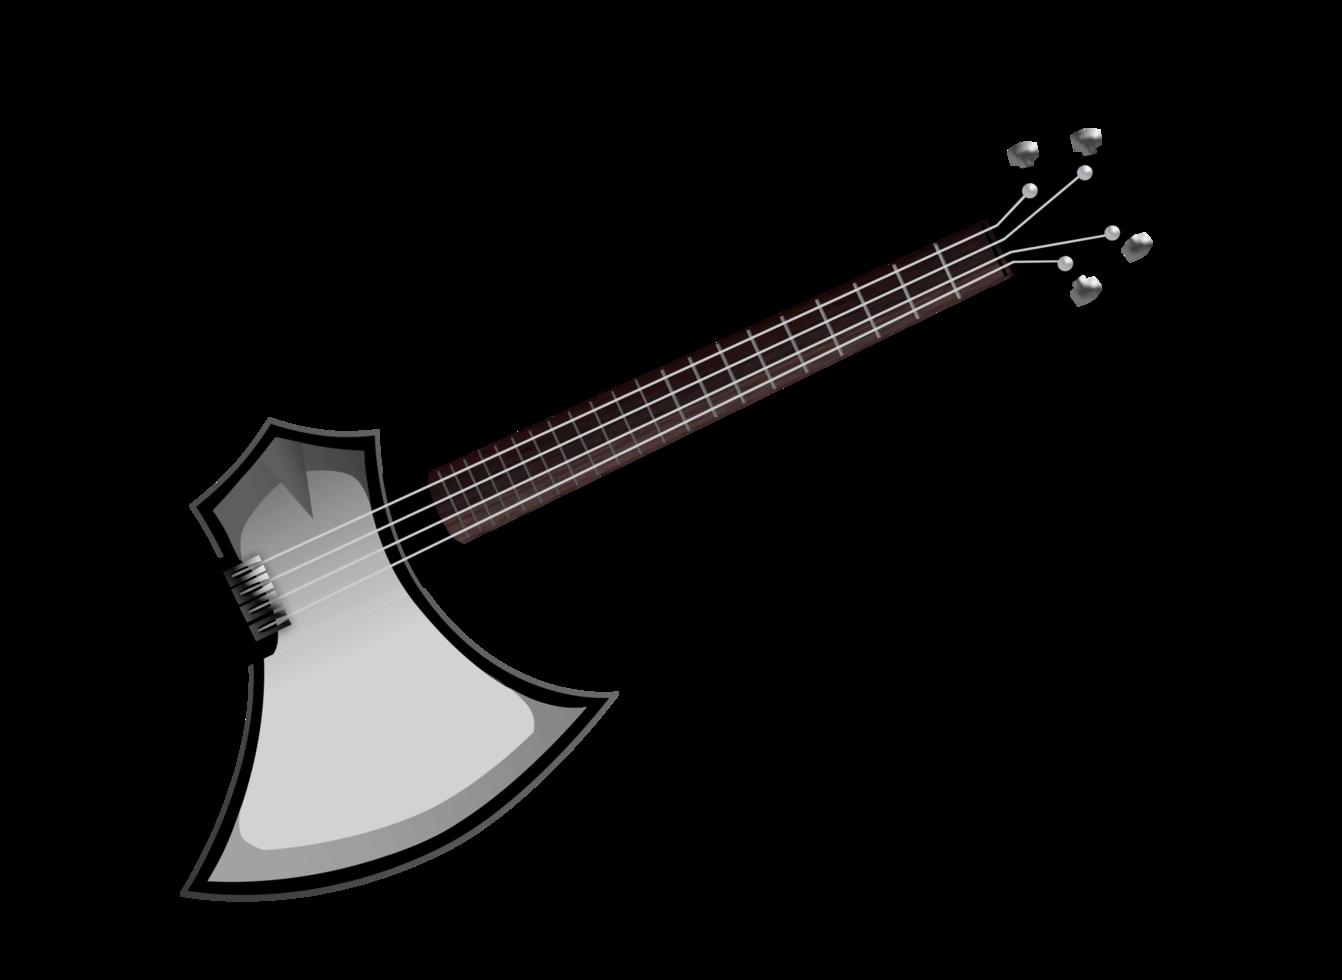 chitarra ax png